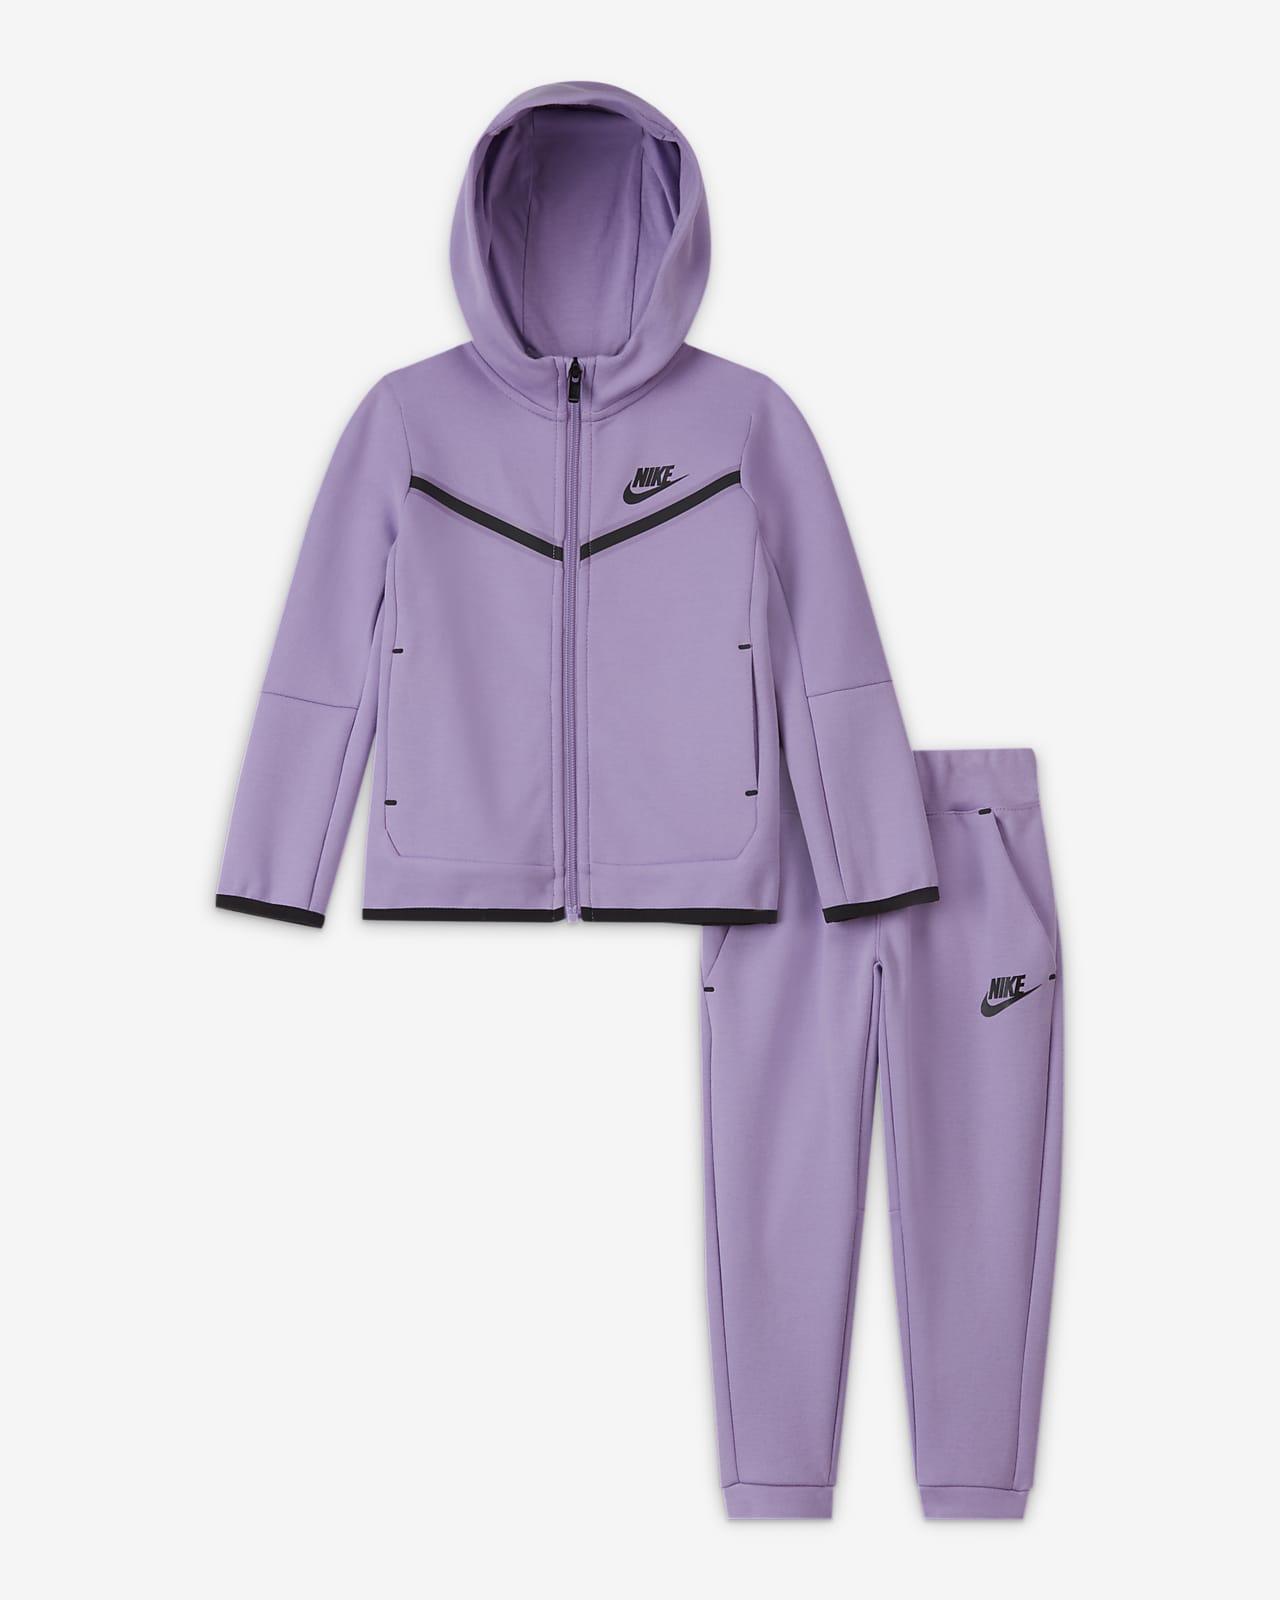 Nike Sportswear Tech Fleece Toddler Zip Hoodie and Pants Set